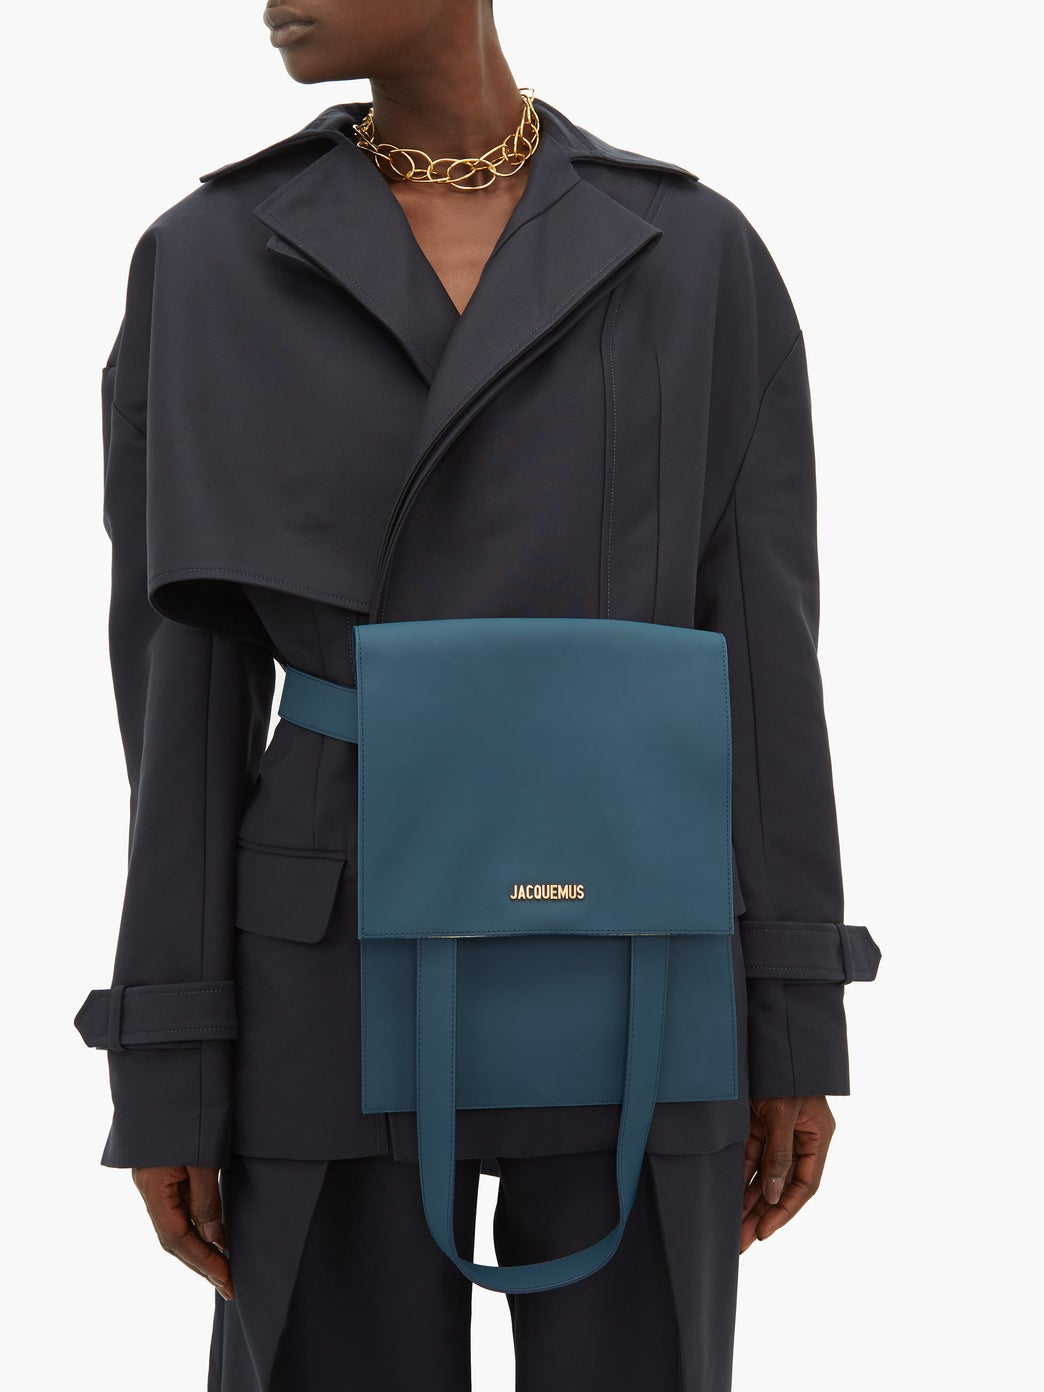 Jaquemus Murano Leather Bag